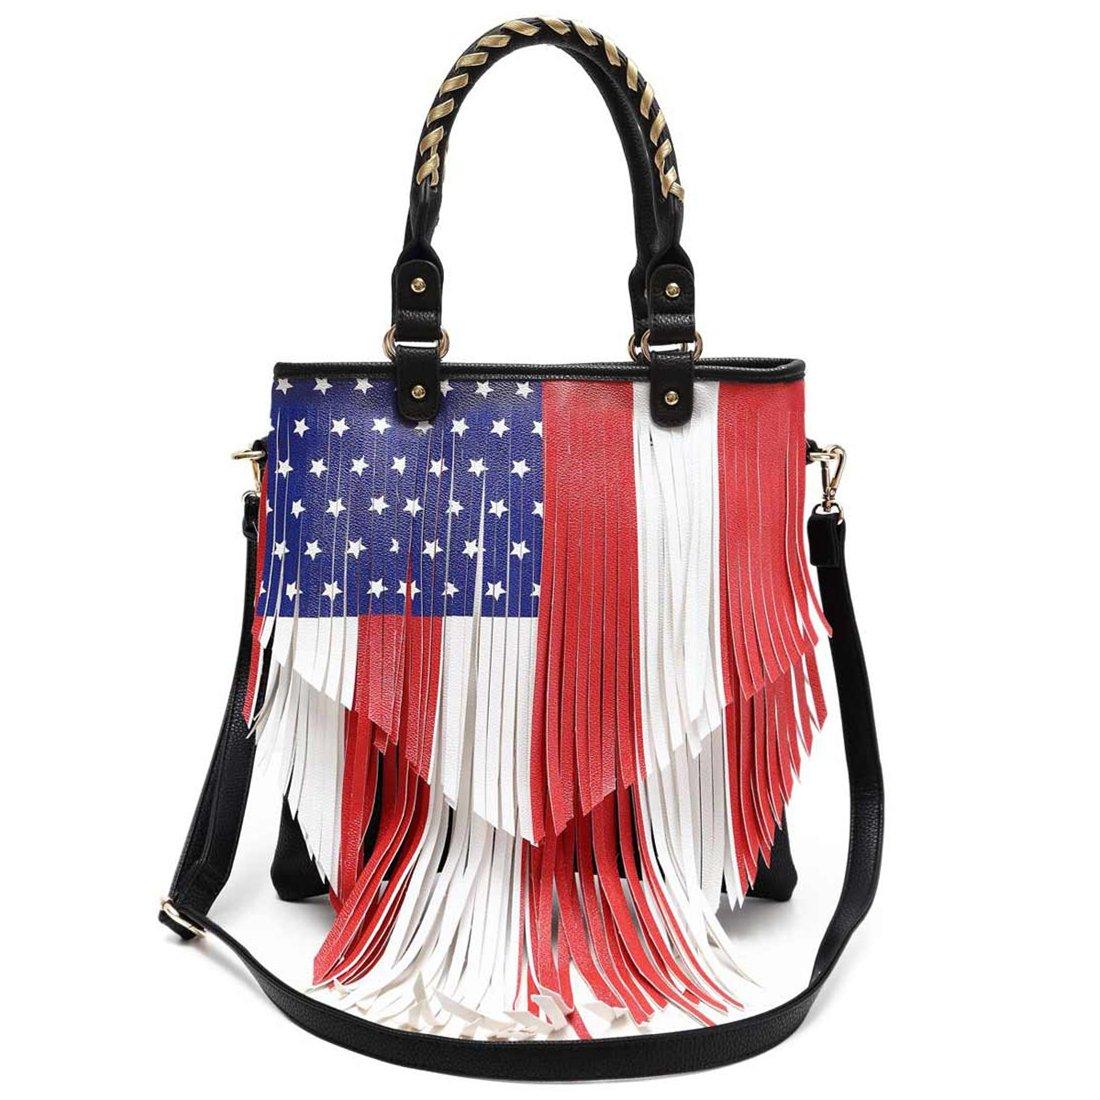 American Flag Stars and Stripes Fringe Cross Body Handbags Western Tote Purse Women Single Shoulder Bag (Black)